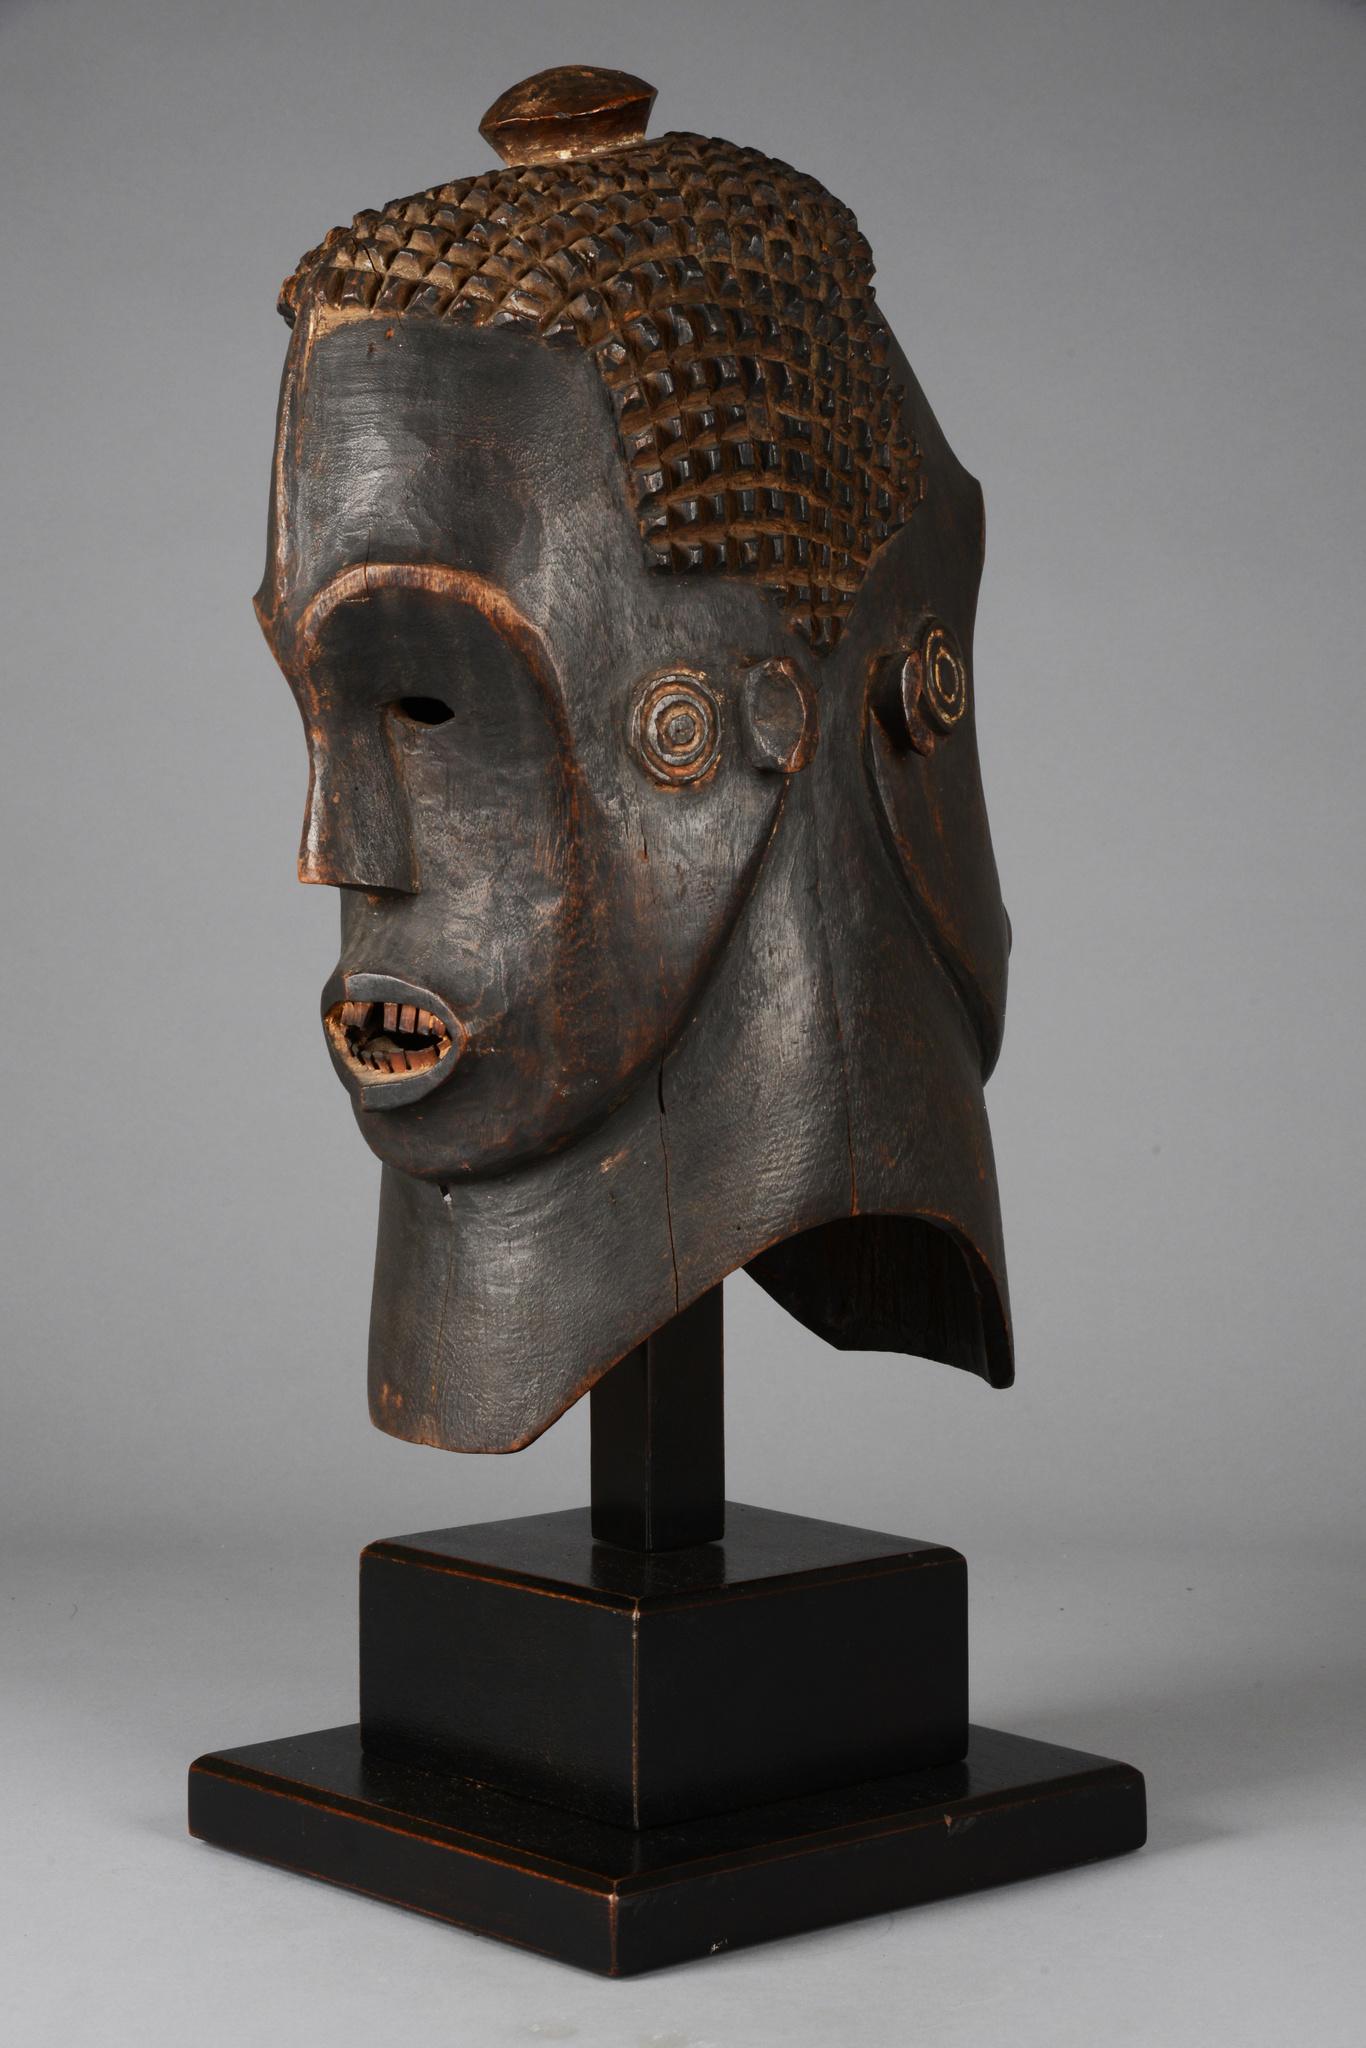 Janus-faced helmet mask